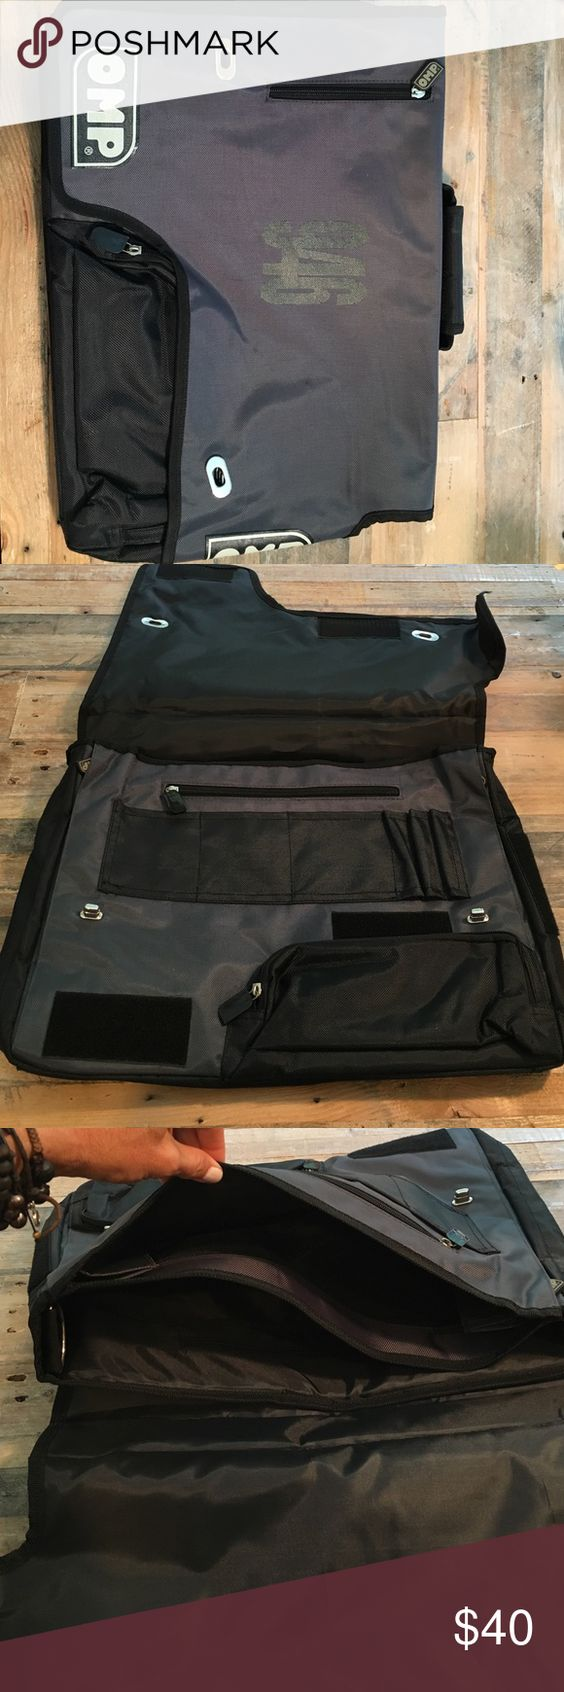 Large OMP messenger bag NWOT Brand new... Grey/black messenger bag/portfolio...many zipper pockets...Velcro pockets inside & out... Handheld & crossbody strap included. Super Drive style never used! OMP Bags Crossbody Bags